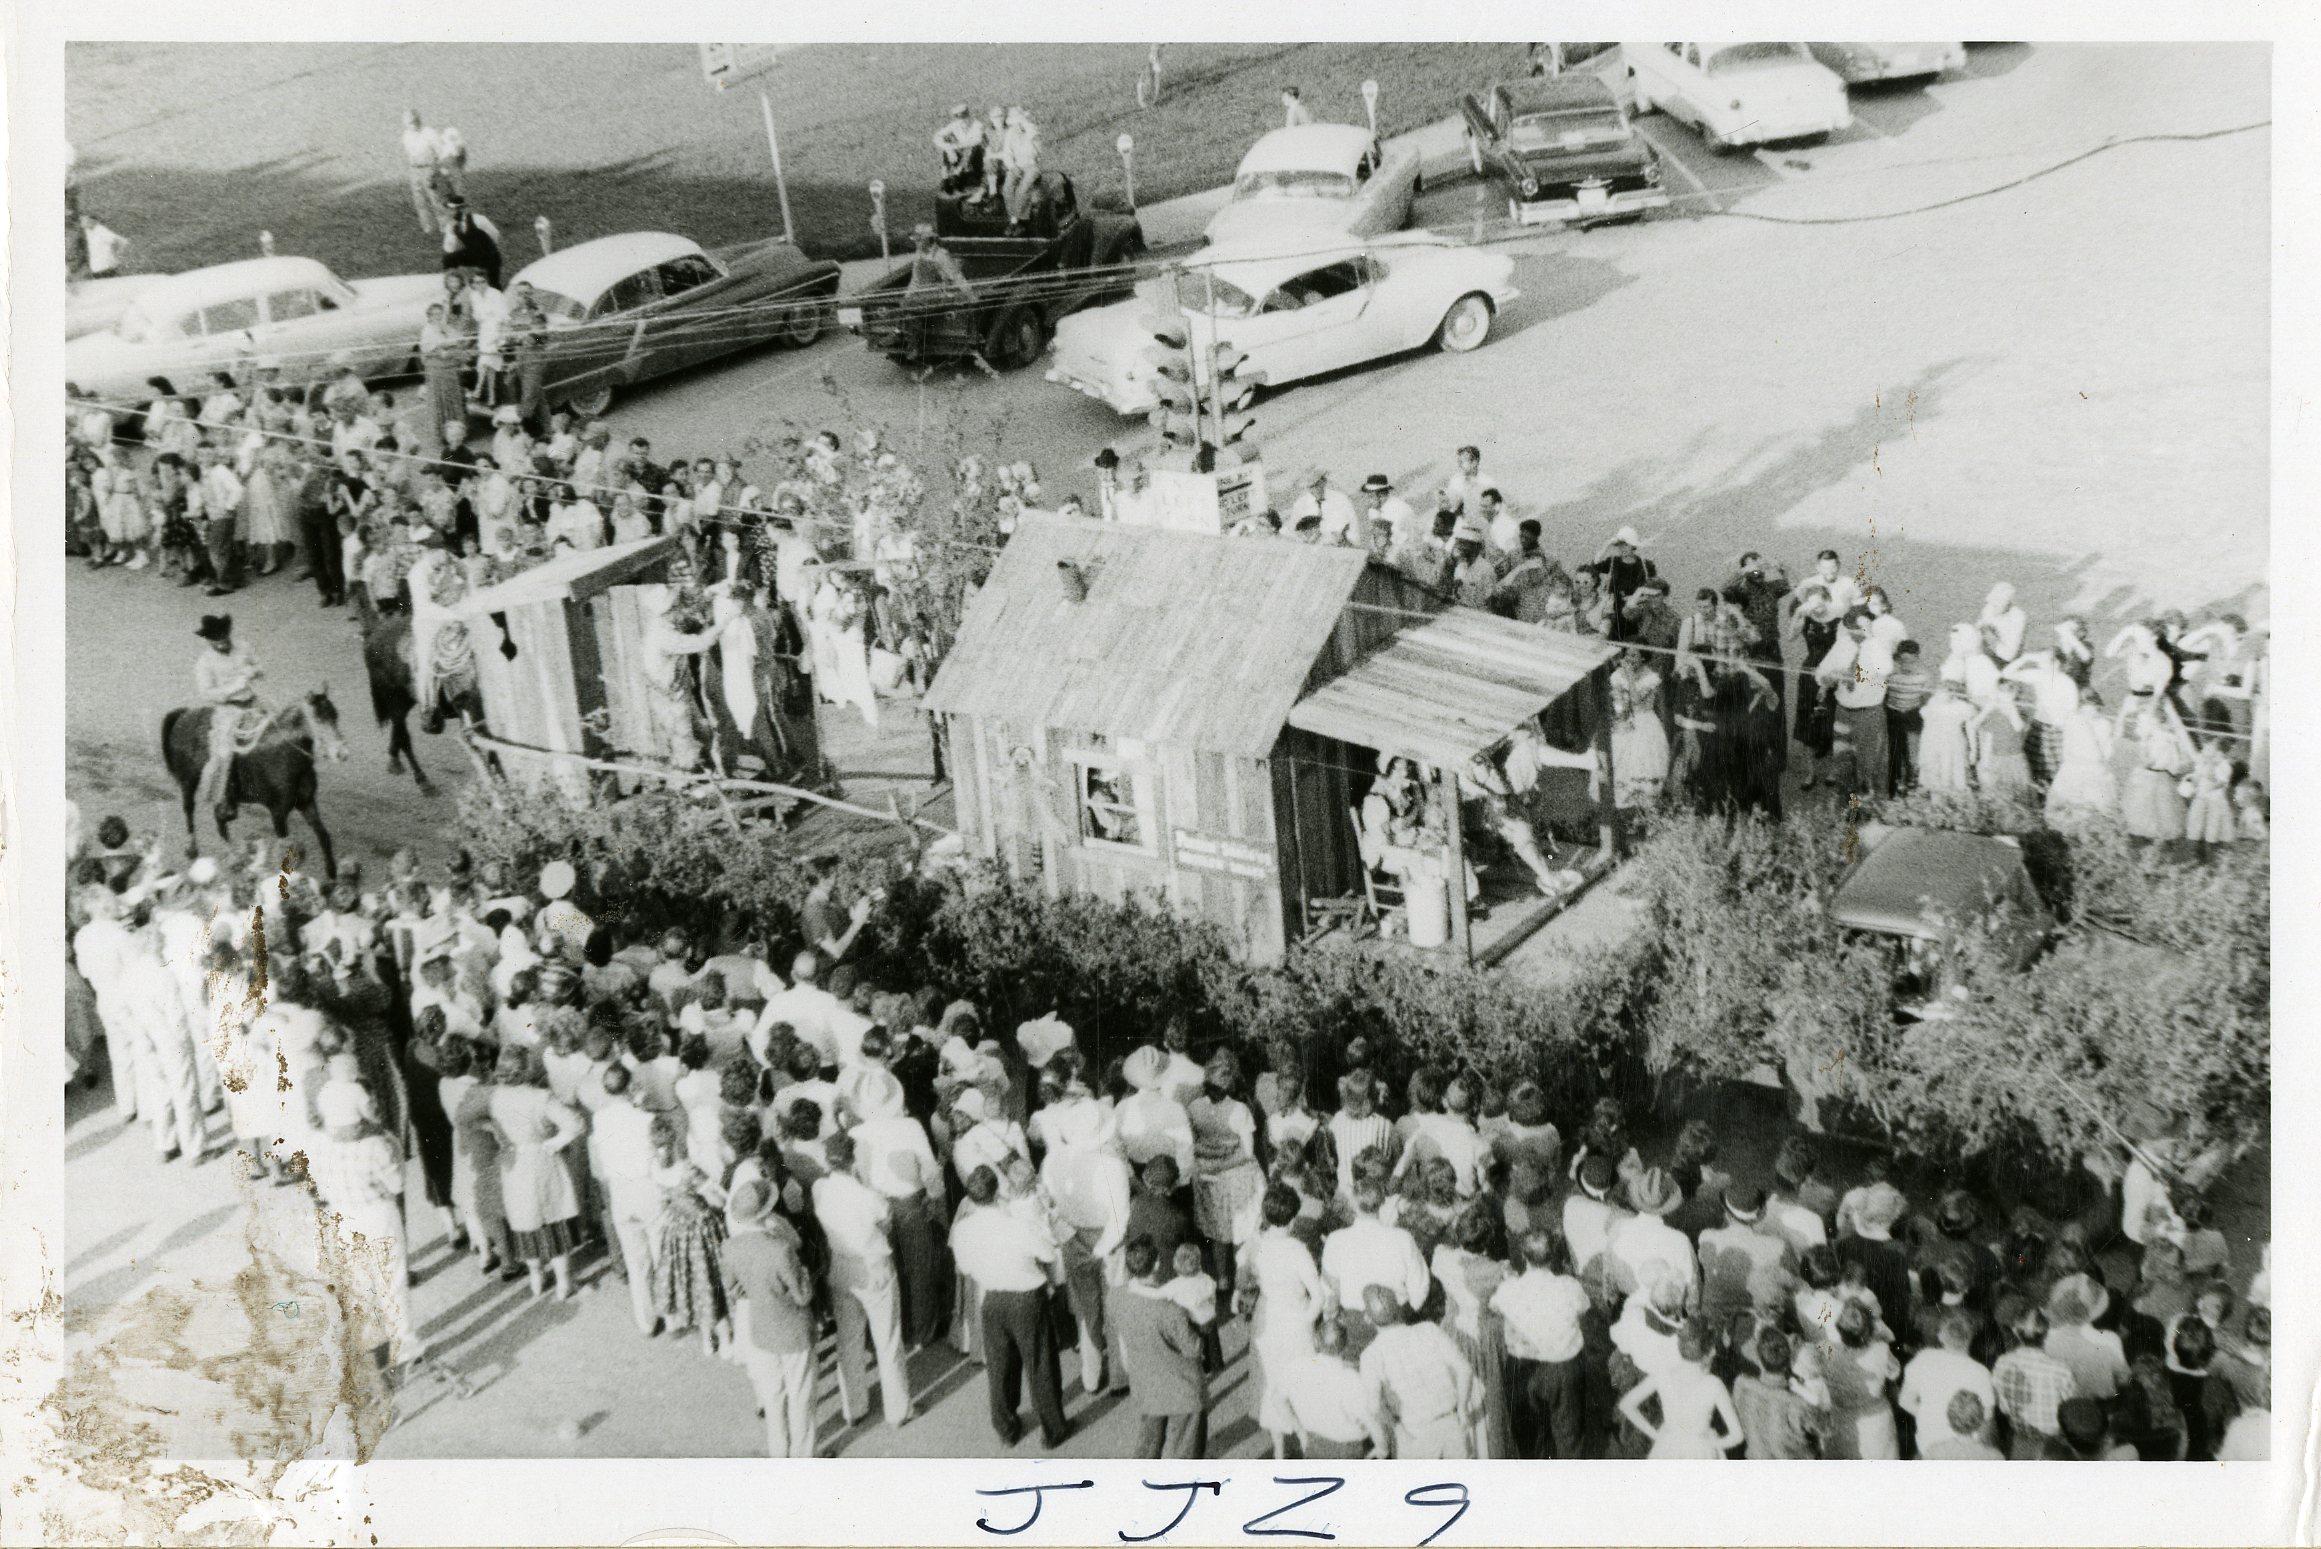 Ponder Hustlin' Belles' First Prize winning float in the Denton Centennial Parade.